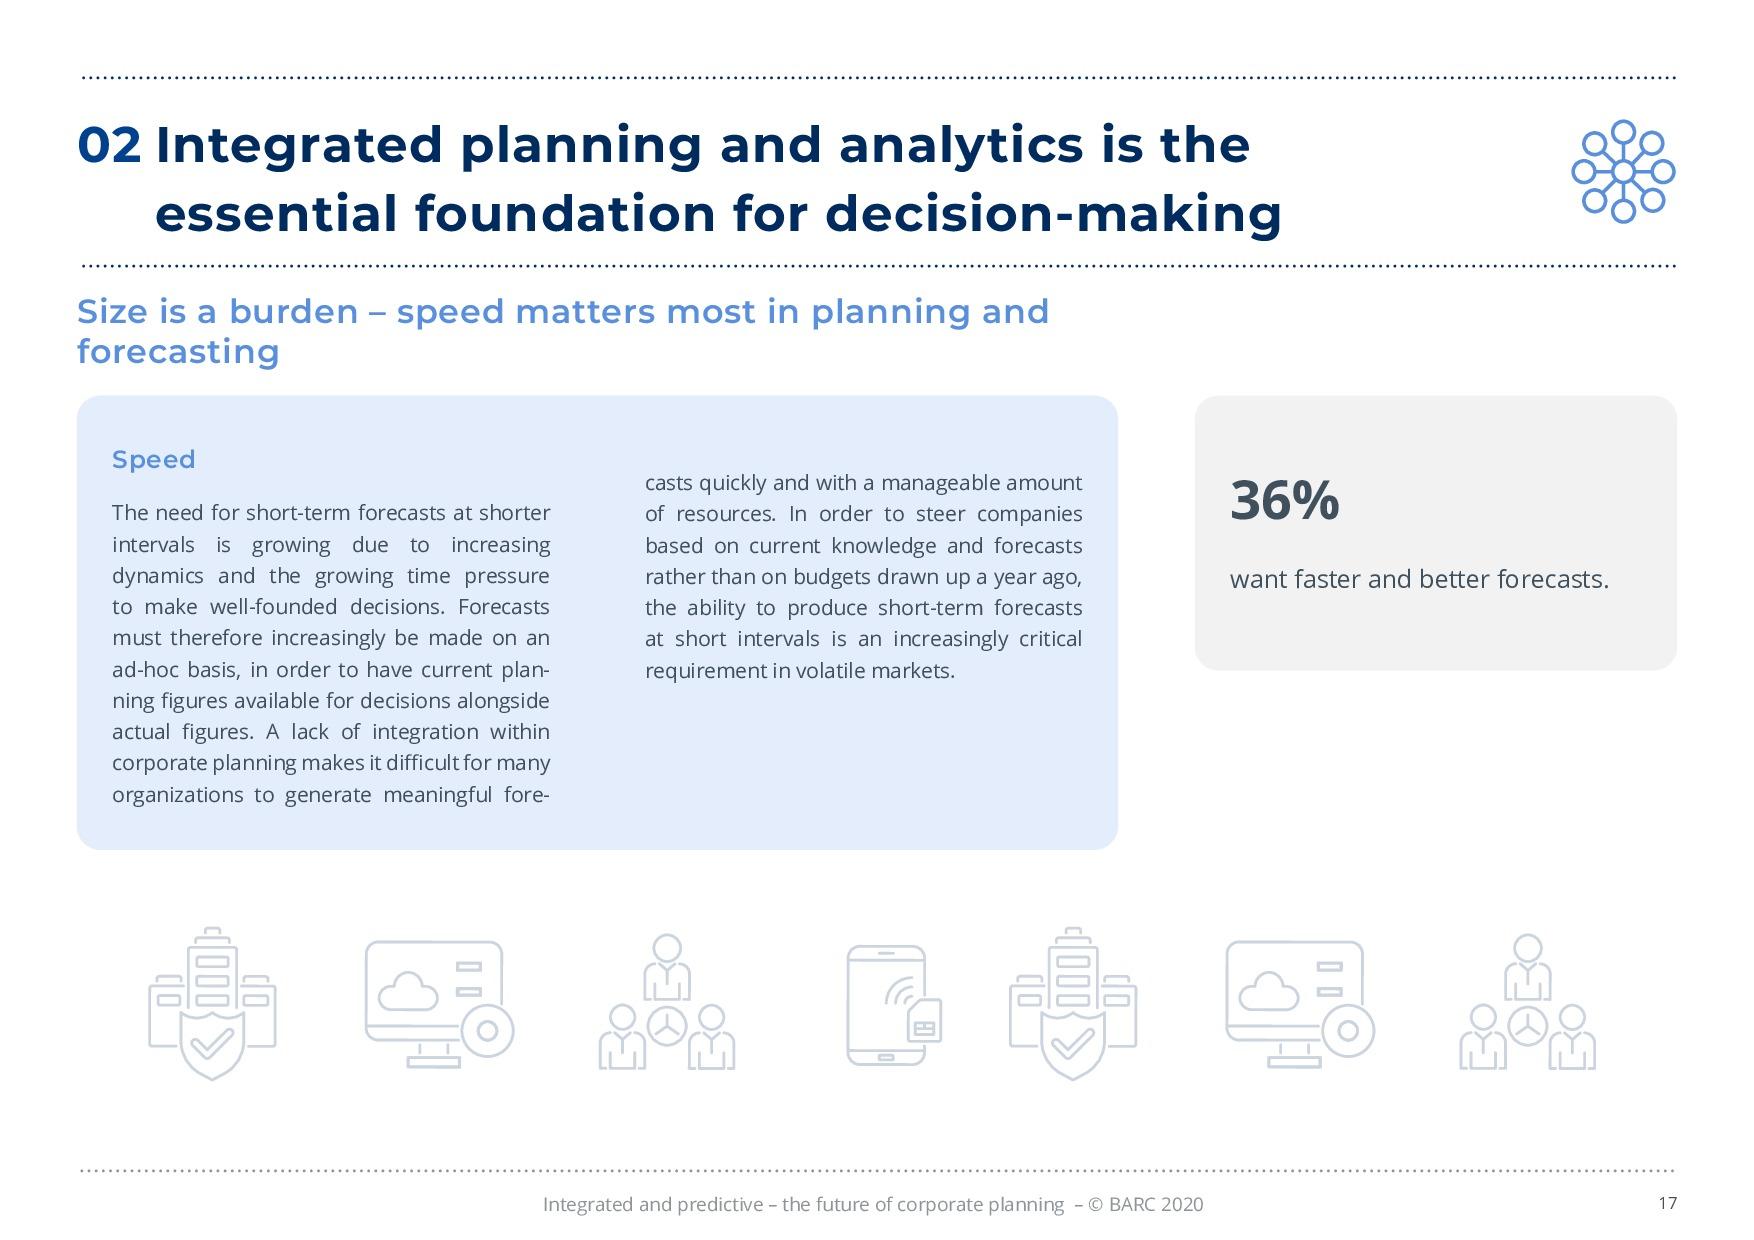 BARC – 統合と予測 – 経営計画の未来 | Page 17